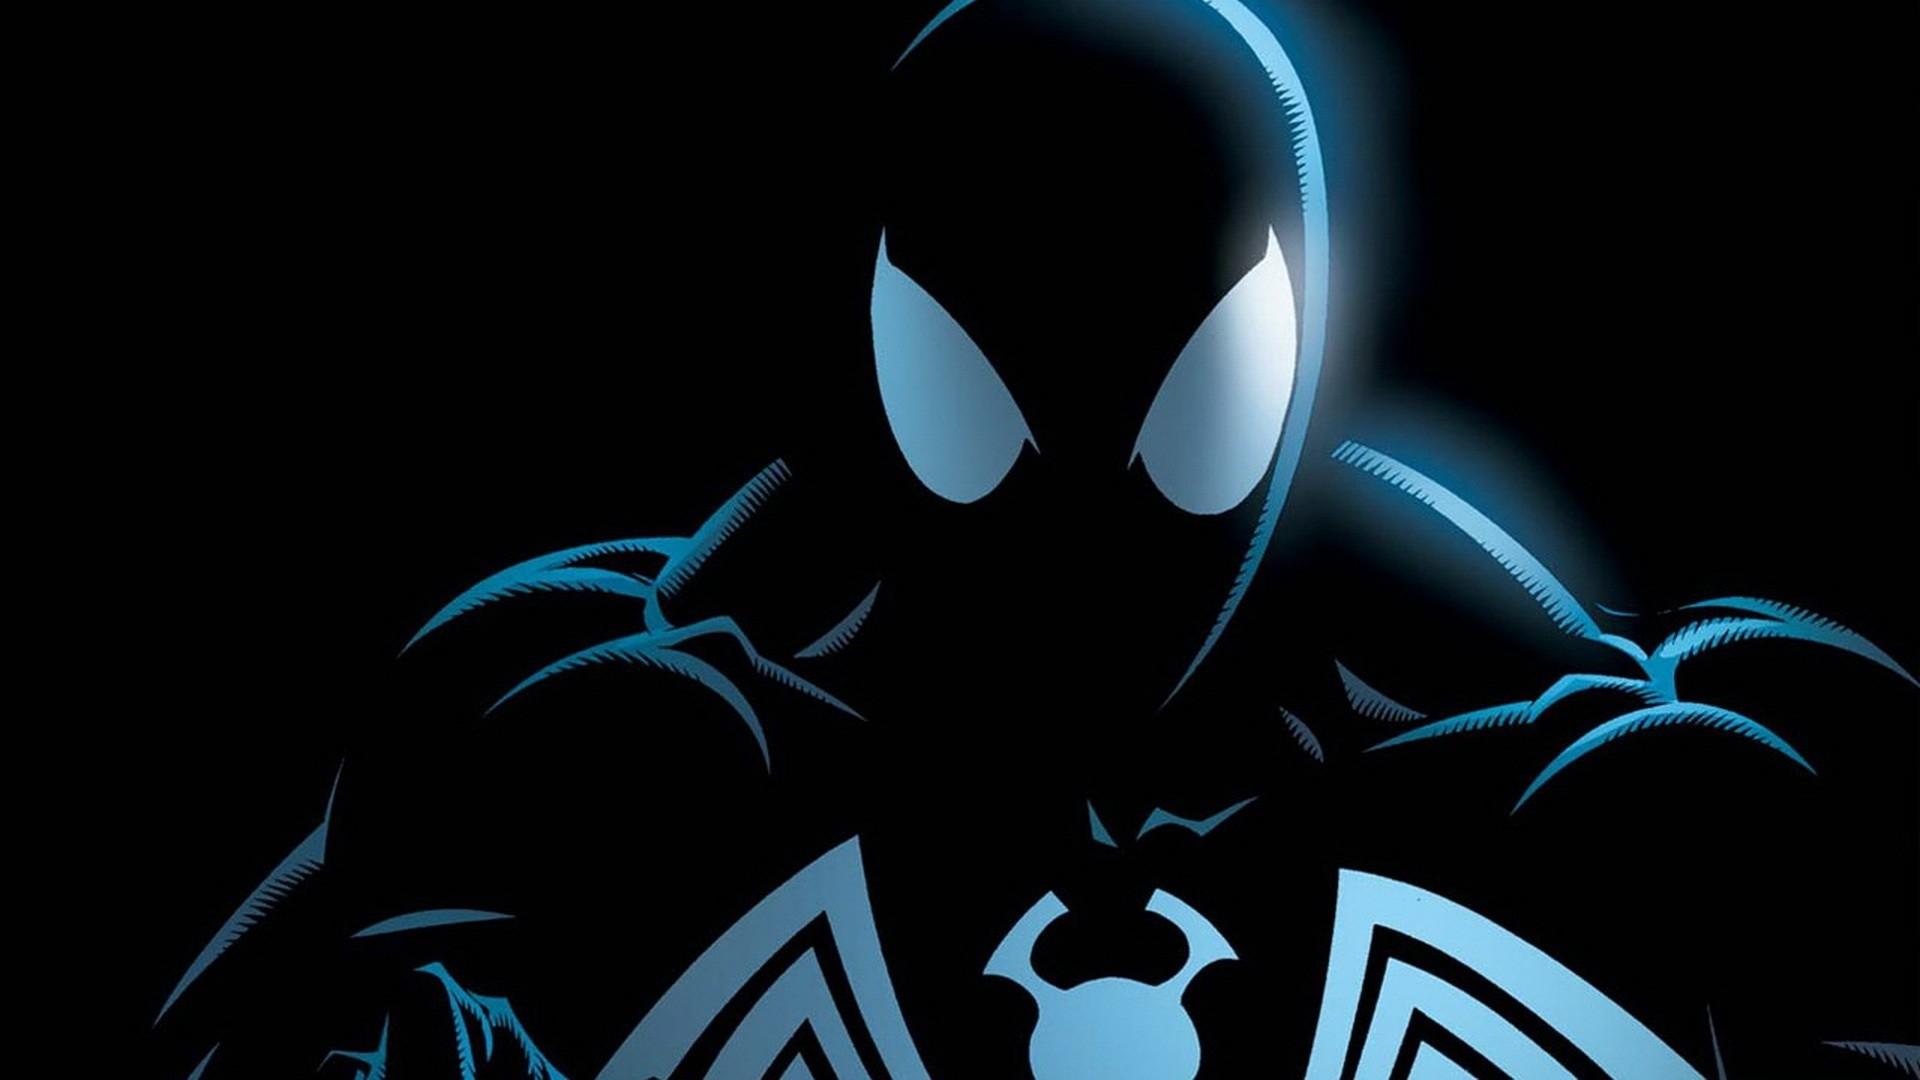 Hd Black Spiderman Iphone Wallpaper - Black Spiderman Wallpaper Hd - HD Wallpaper